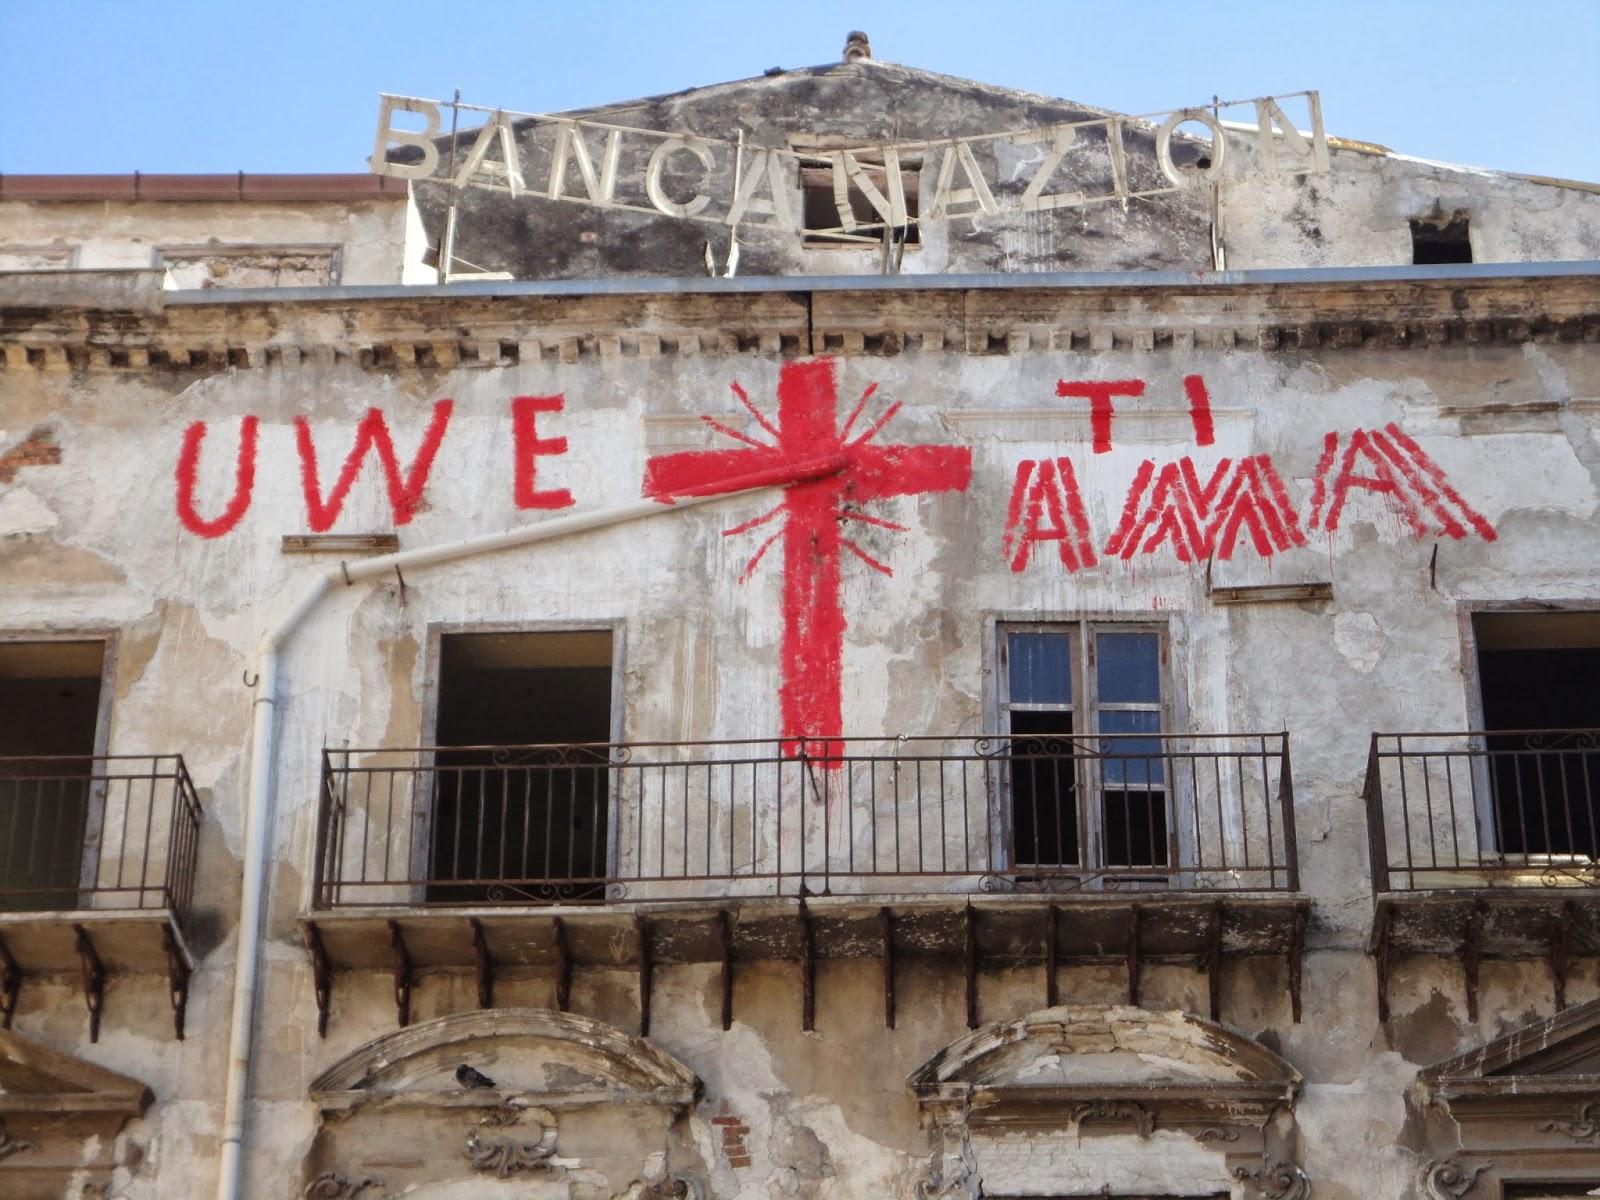 Palermo-Piazza-Garraffaello-muro-palazzo-crollato-uwe